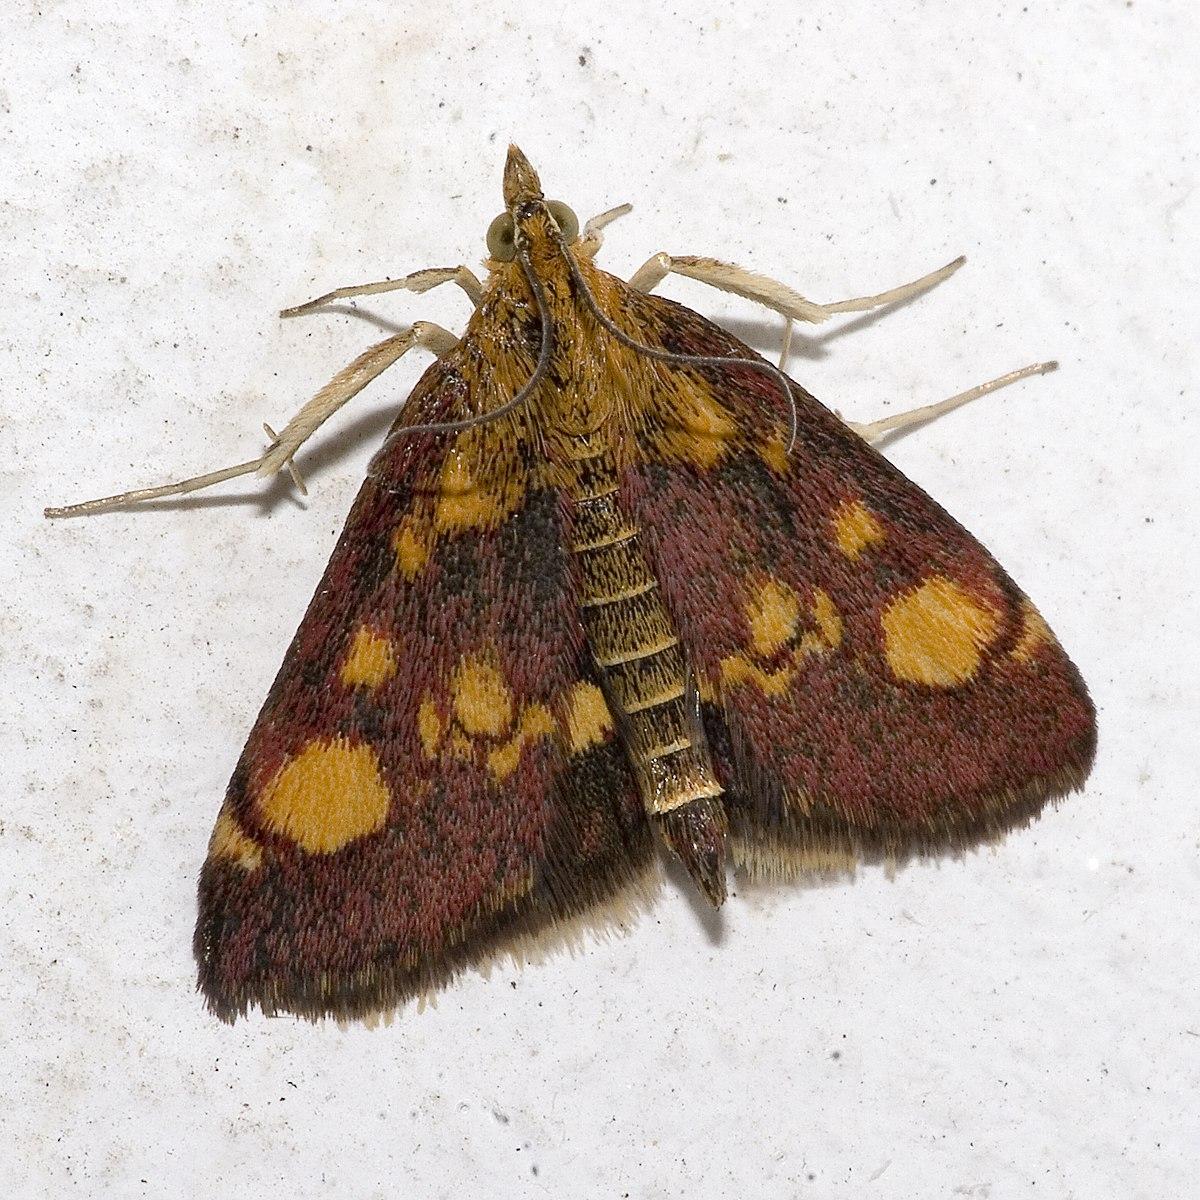 Small Moths In Kitchen